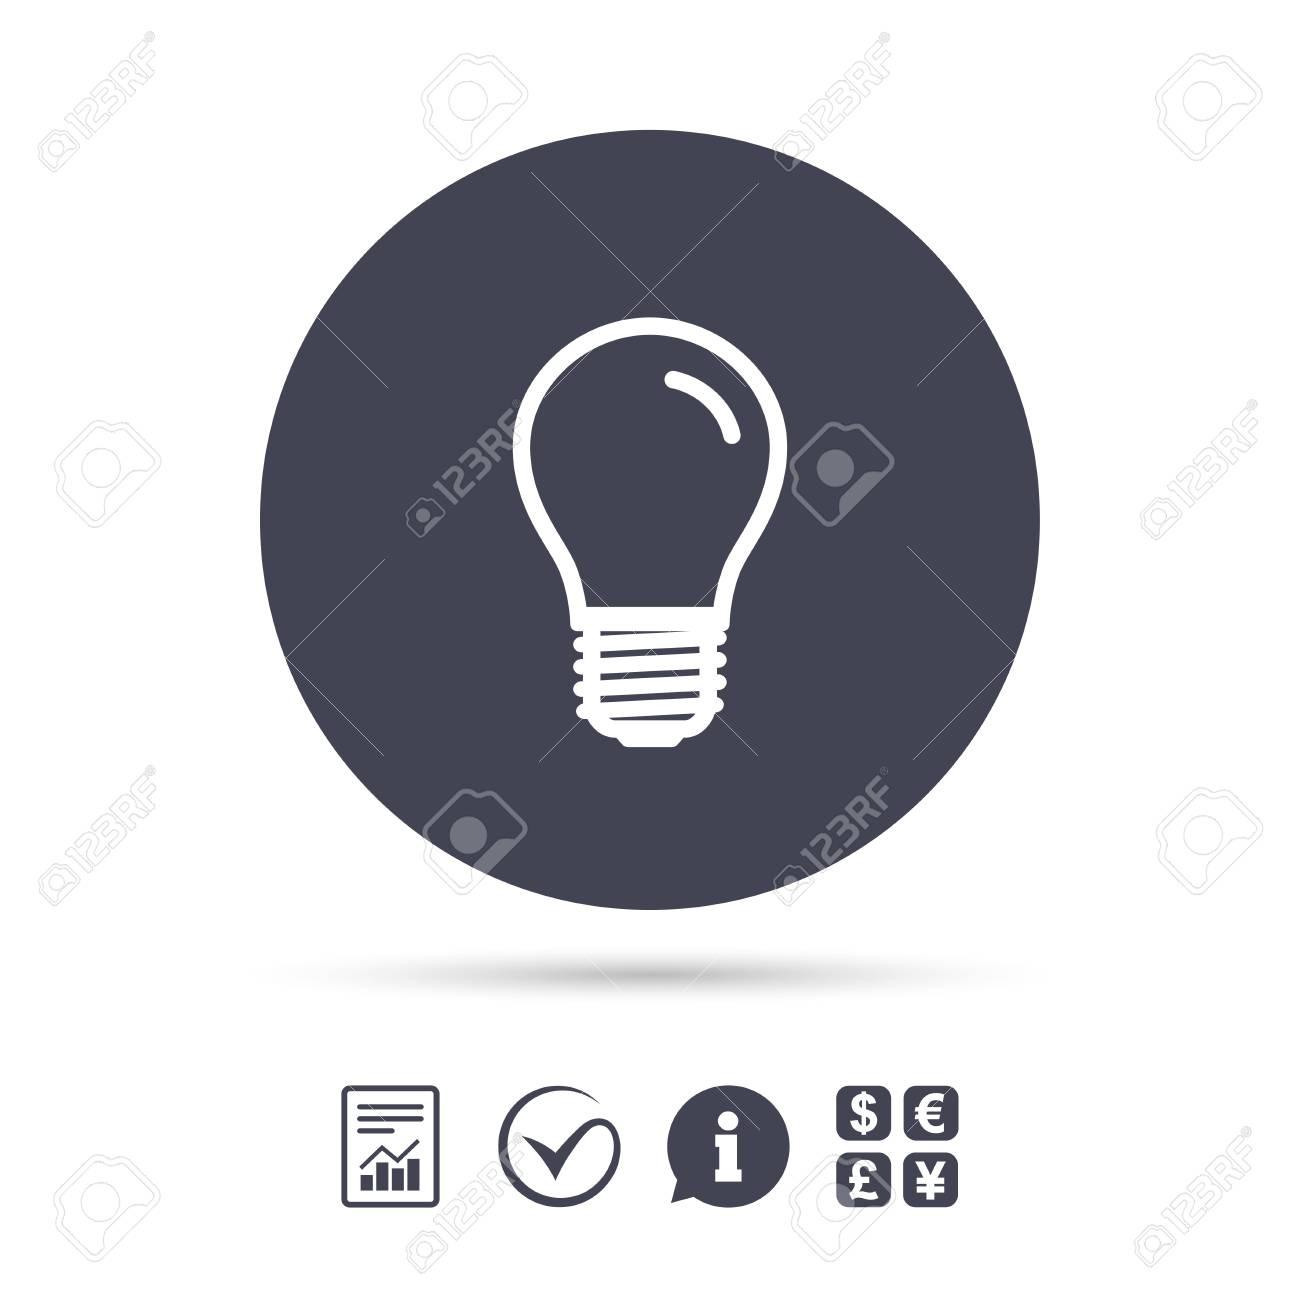 Light Bulb Icon Lamp E27 Screw Socket Symbol Led Light Sign